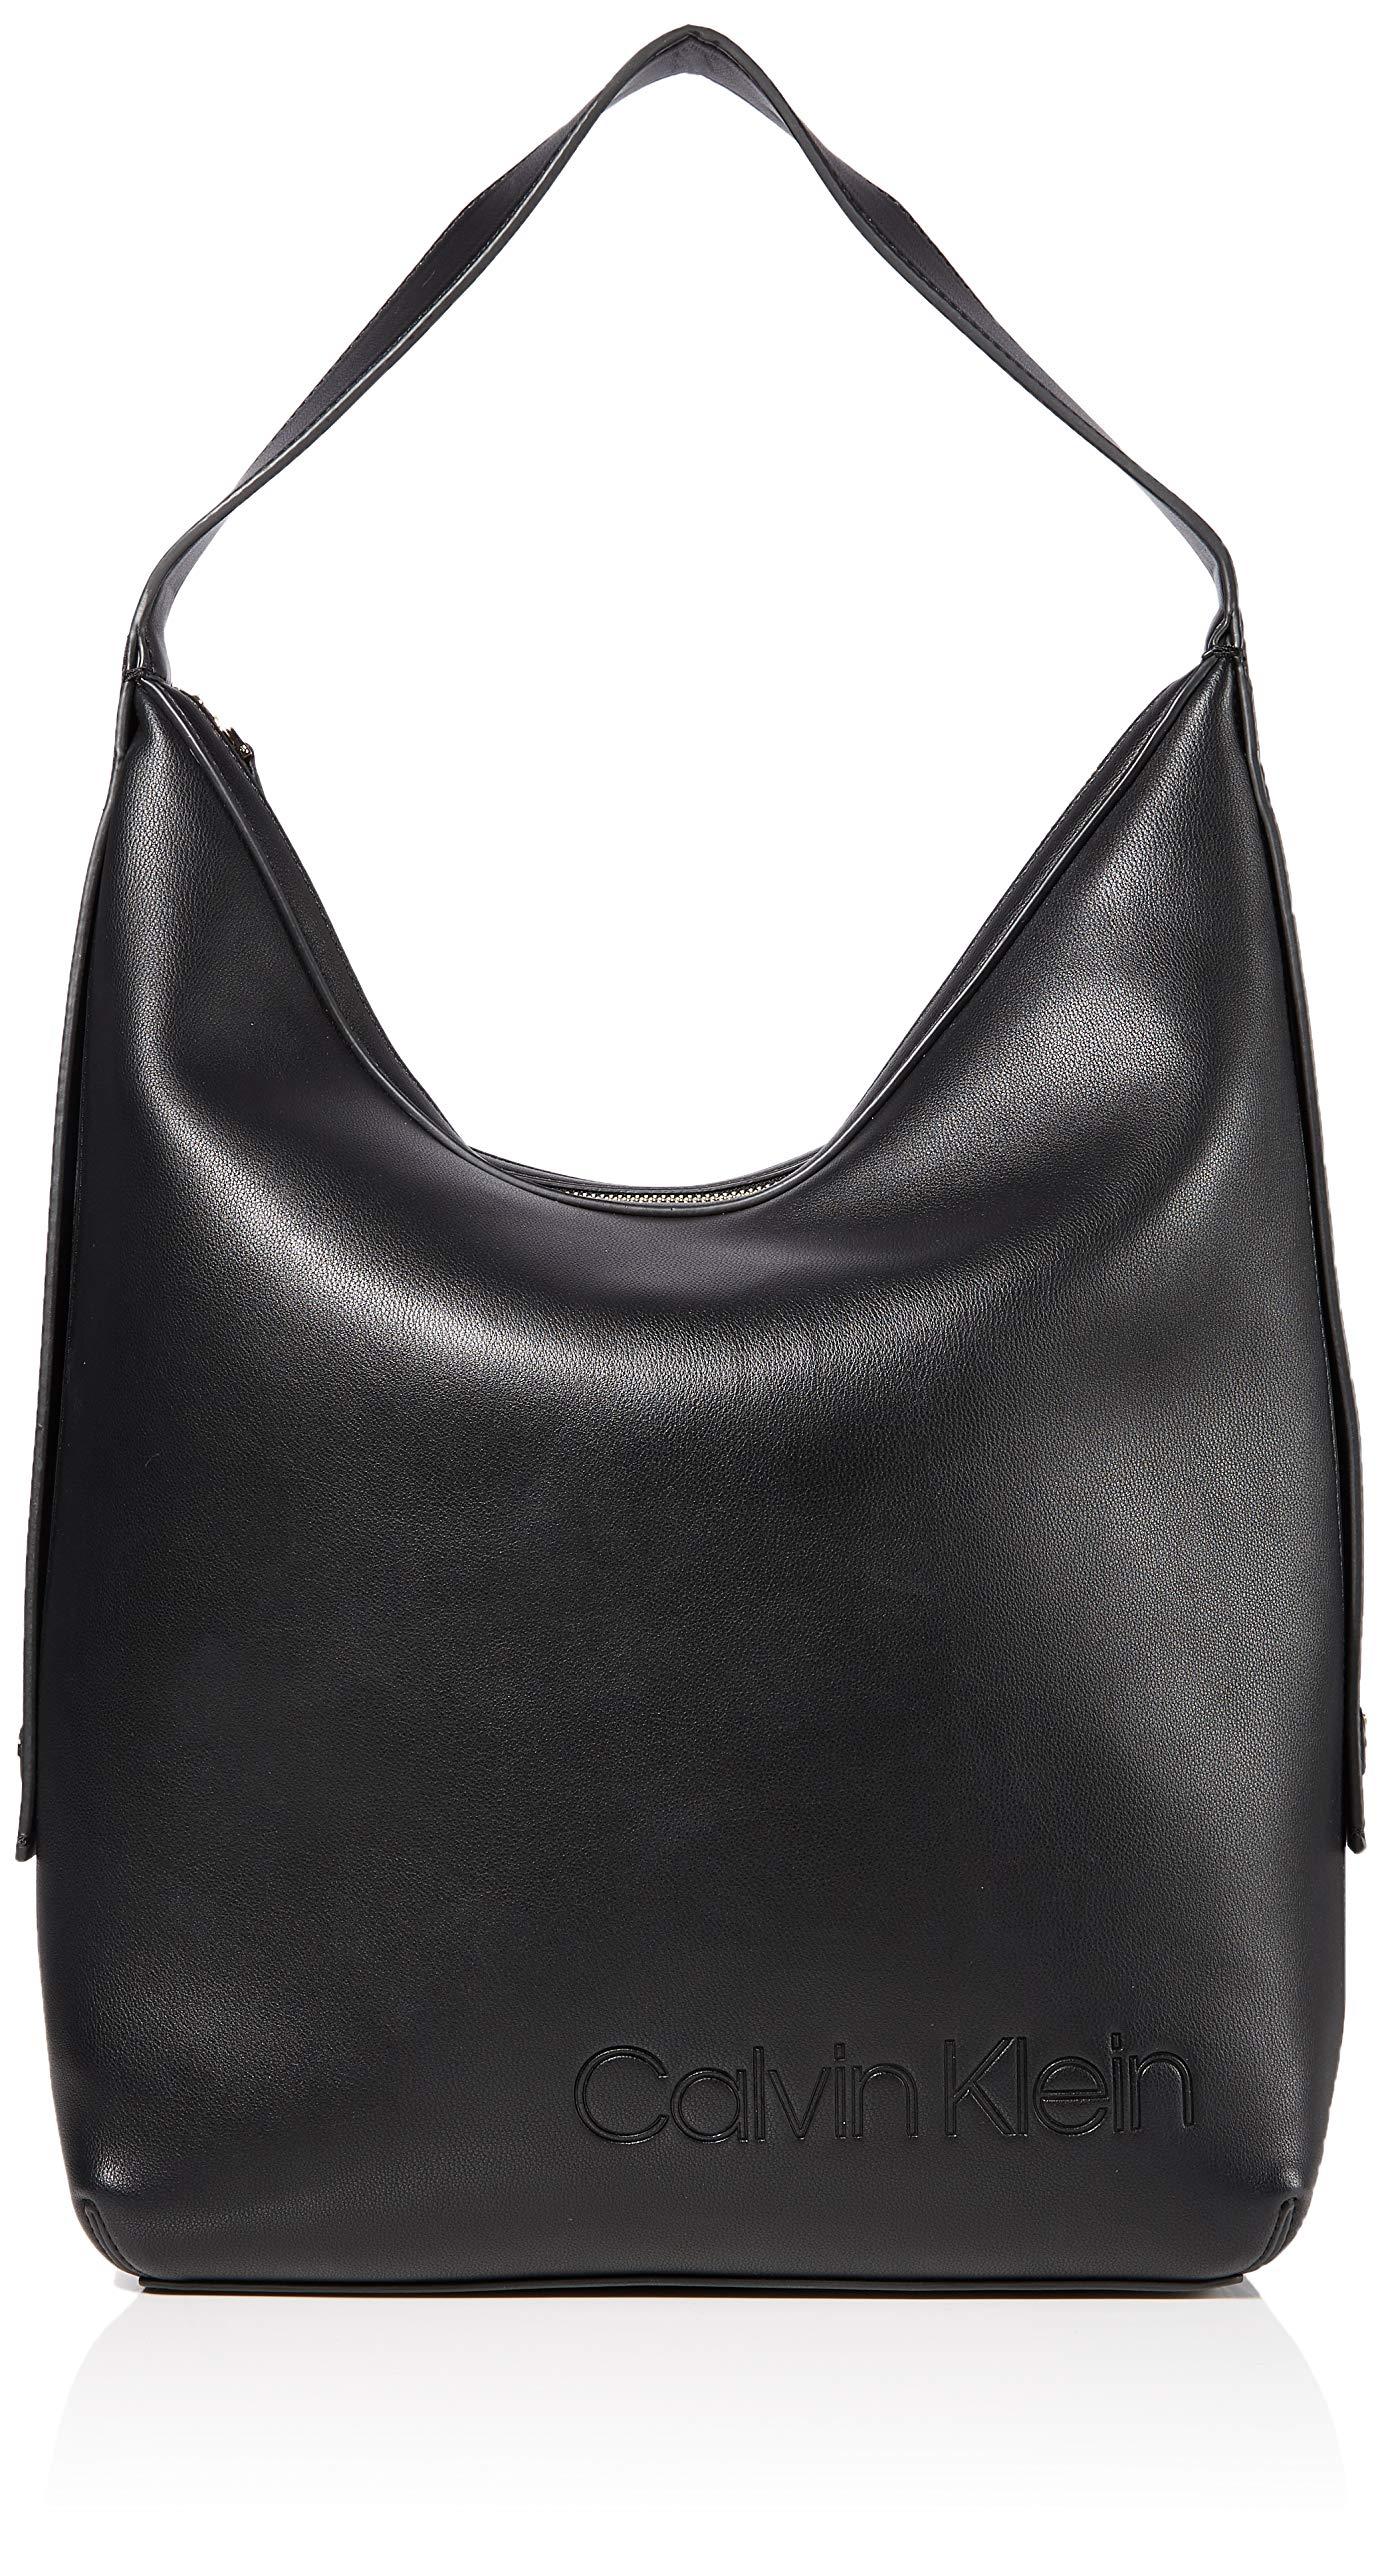 Calvin Klein ATTACHED HOBOMujerBolsos bandoleraNegro (Black) 15x42x43 centimeters (B x H x T)